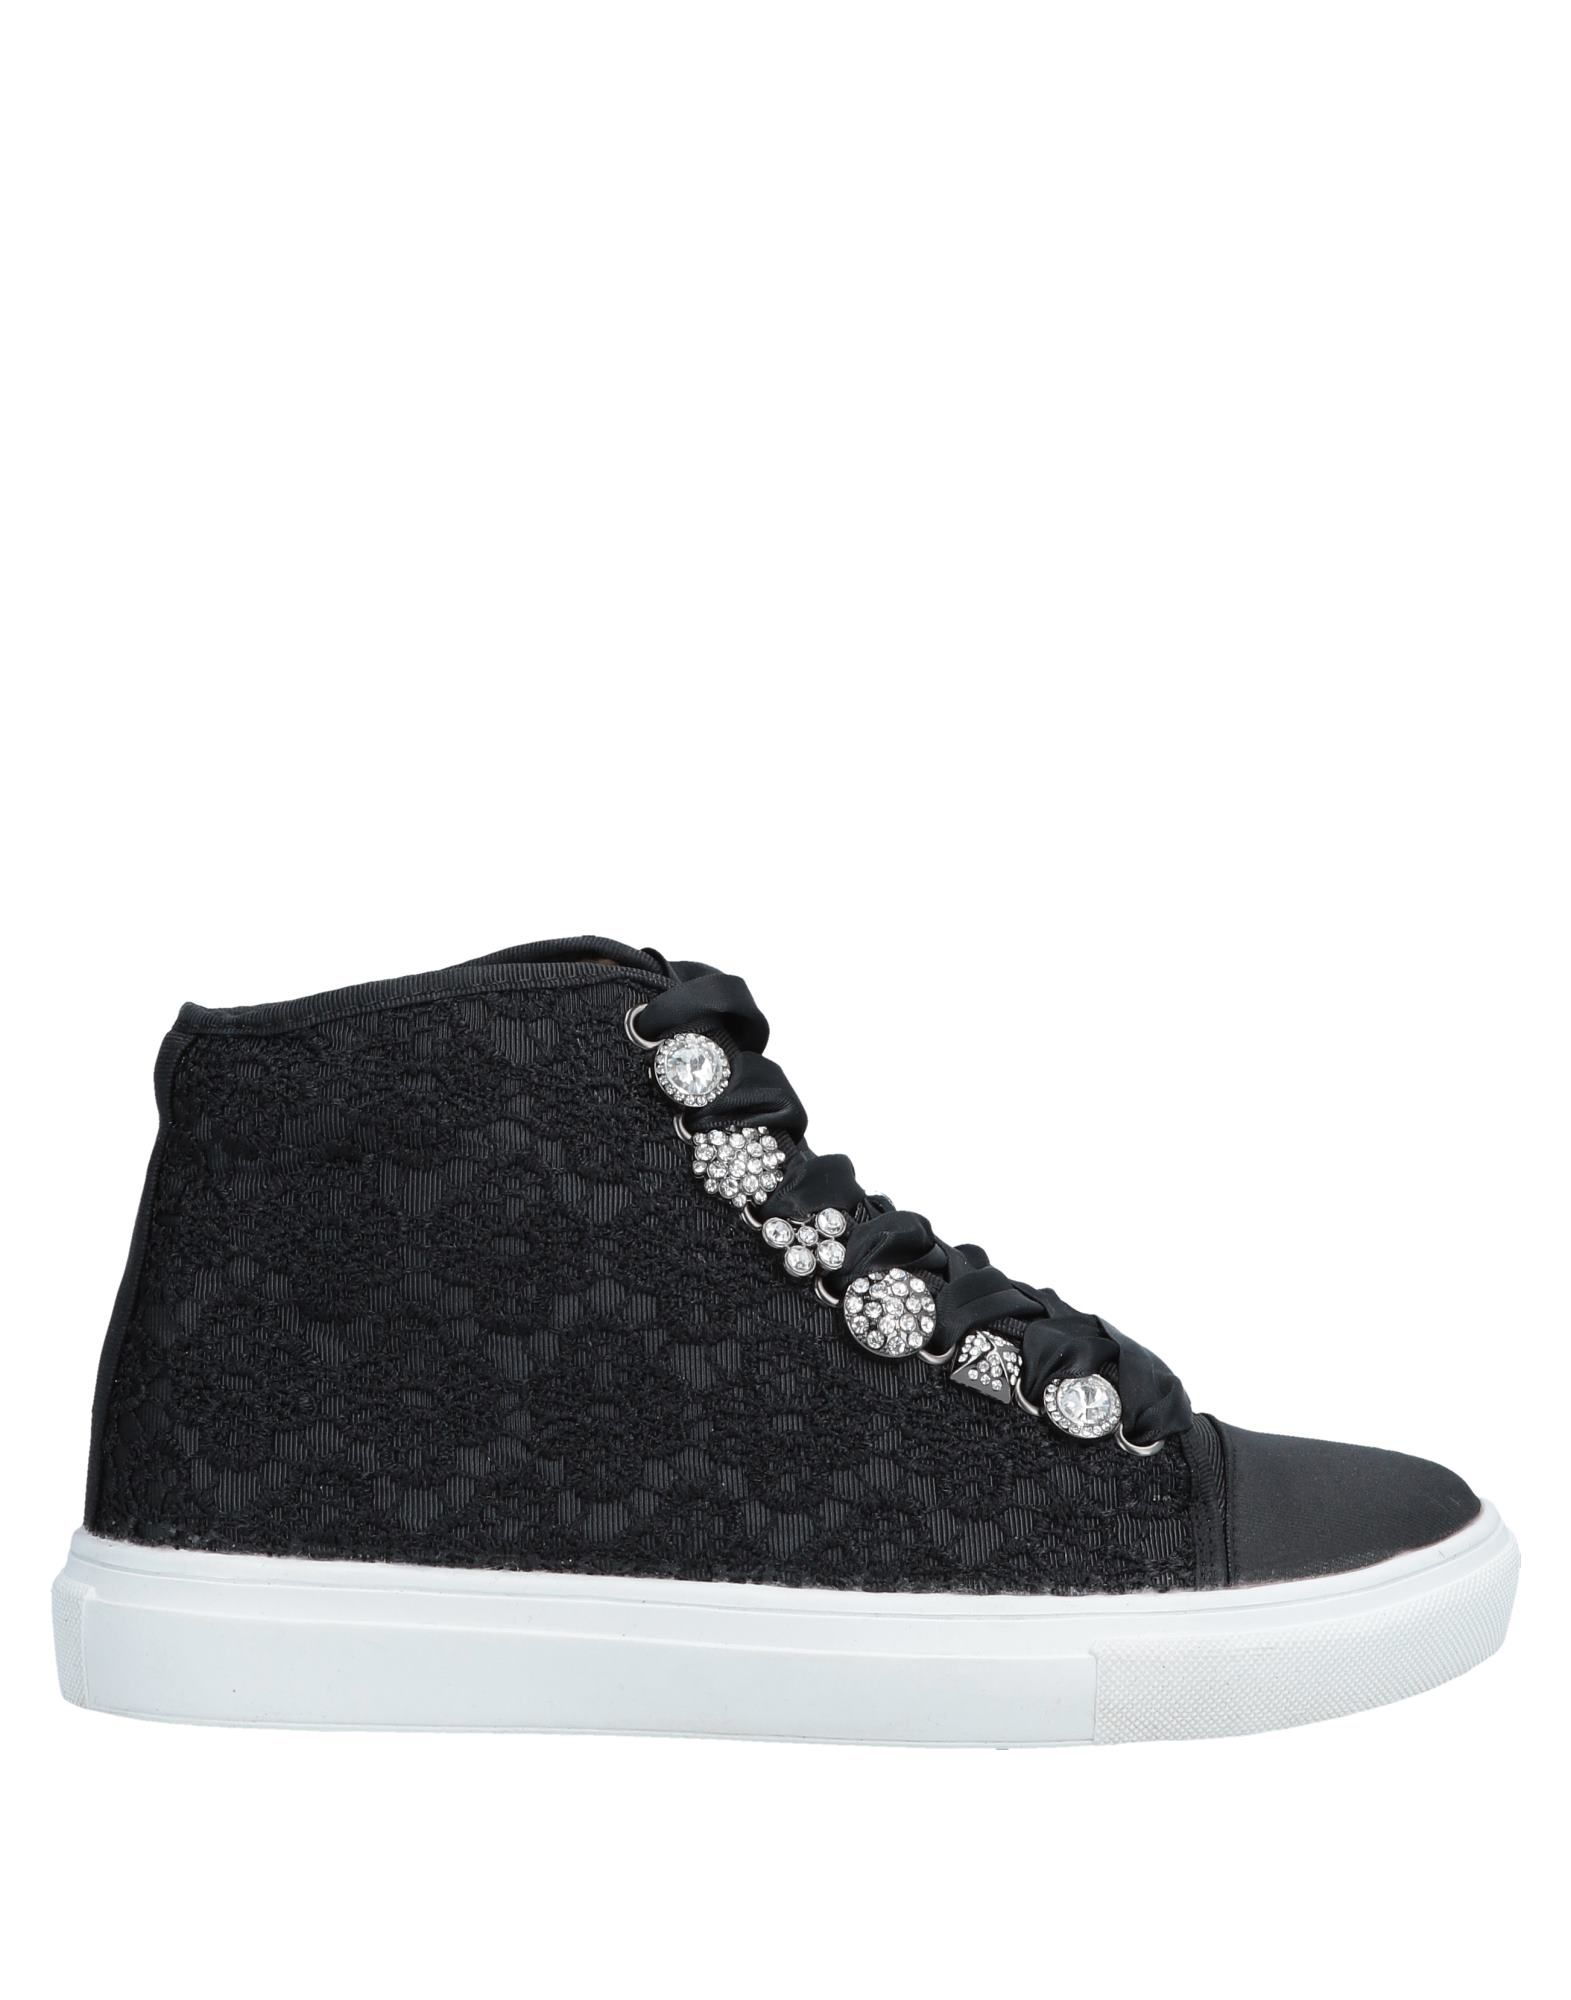 06 MILANO Высокие кеды и кроссовки new arrivals hot non slip sandals high heel arch cushion support silicone gel pads shoes